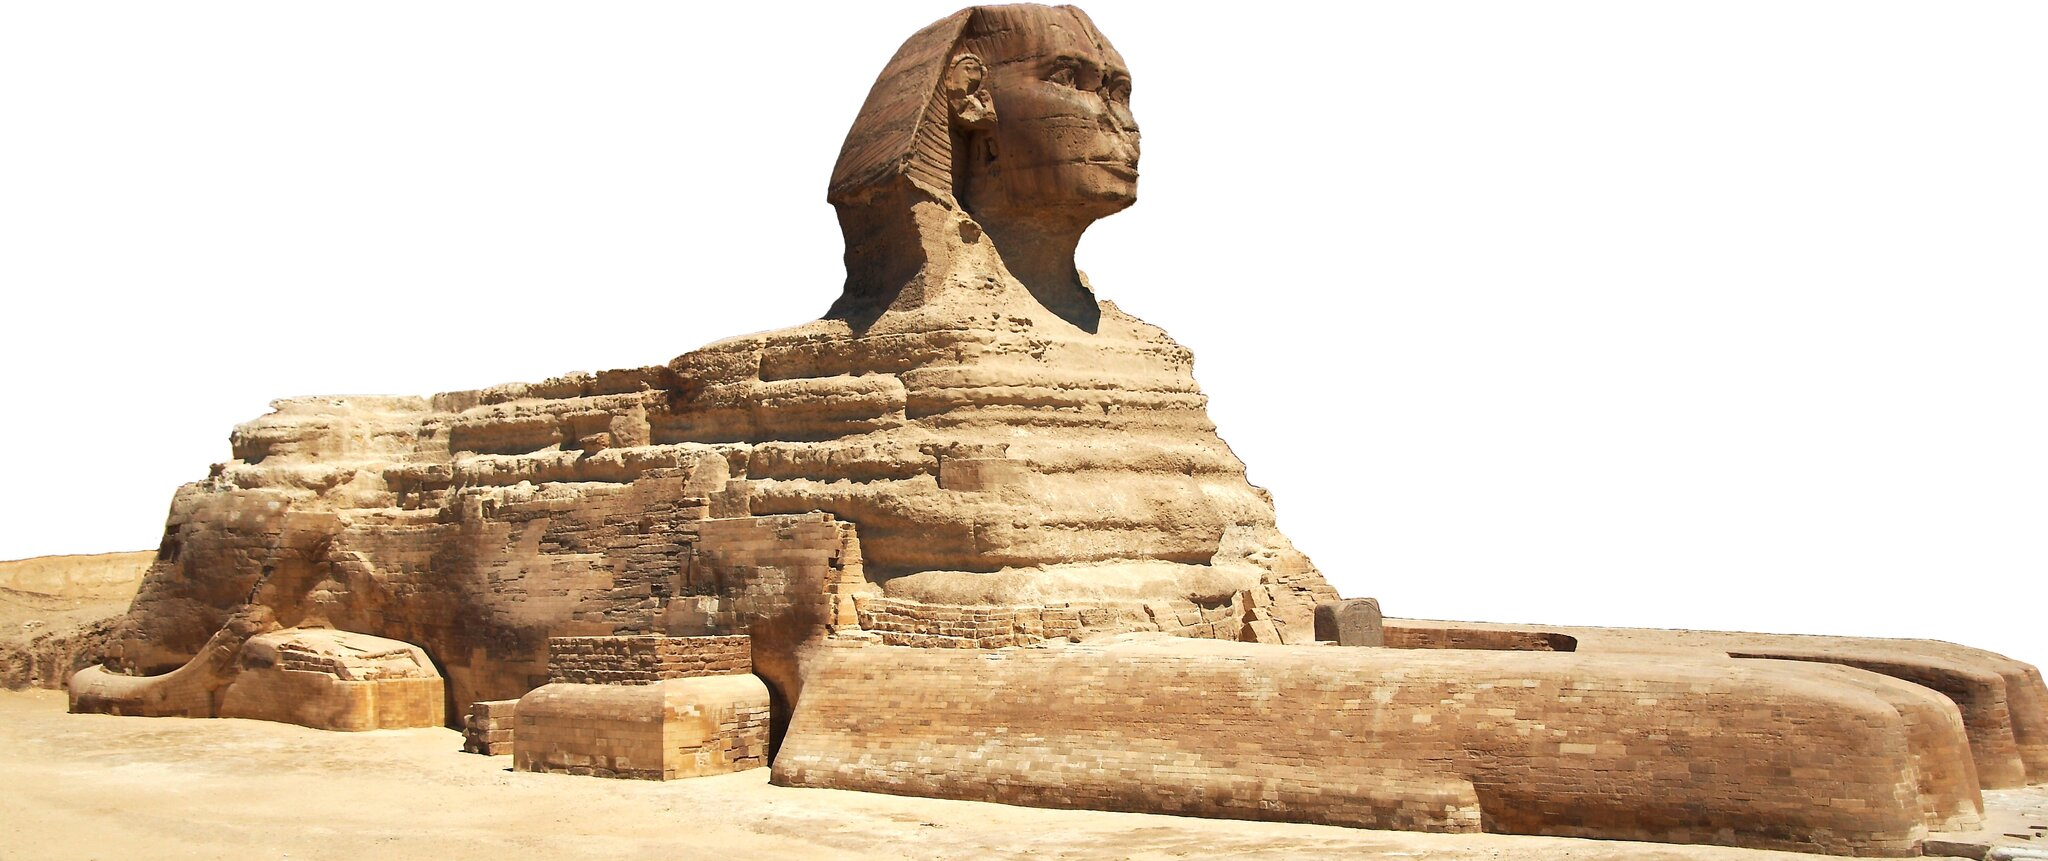 Sfinks Sfinks Źródło: Barcex, Wikimedia Commons, licencja: CC BY-SA 3.0.